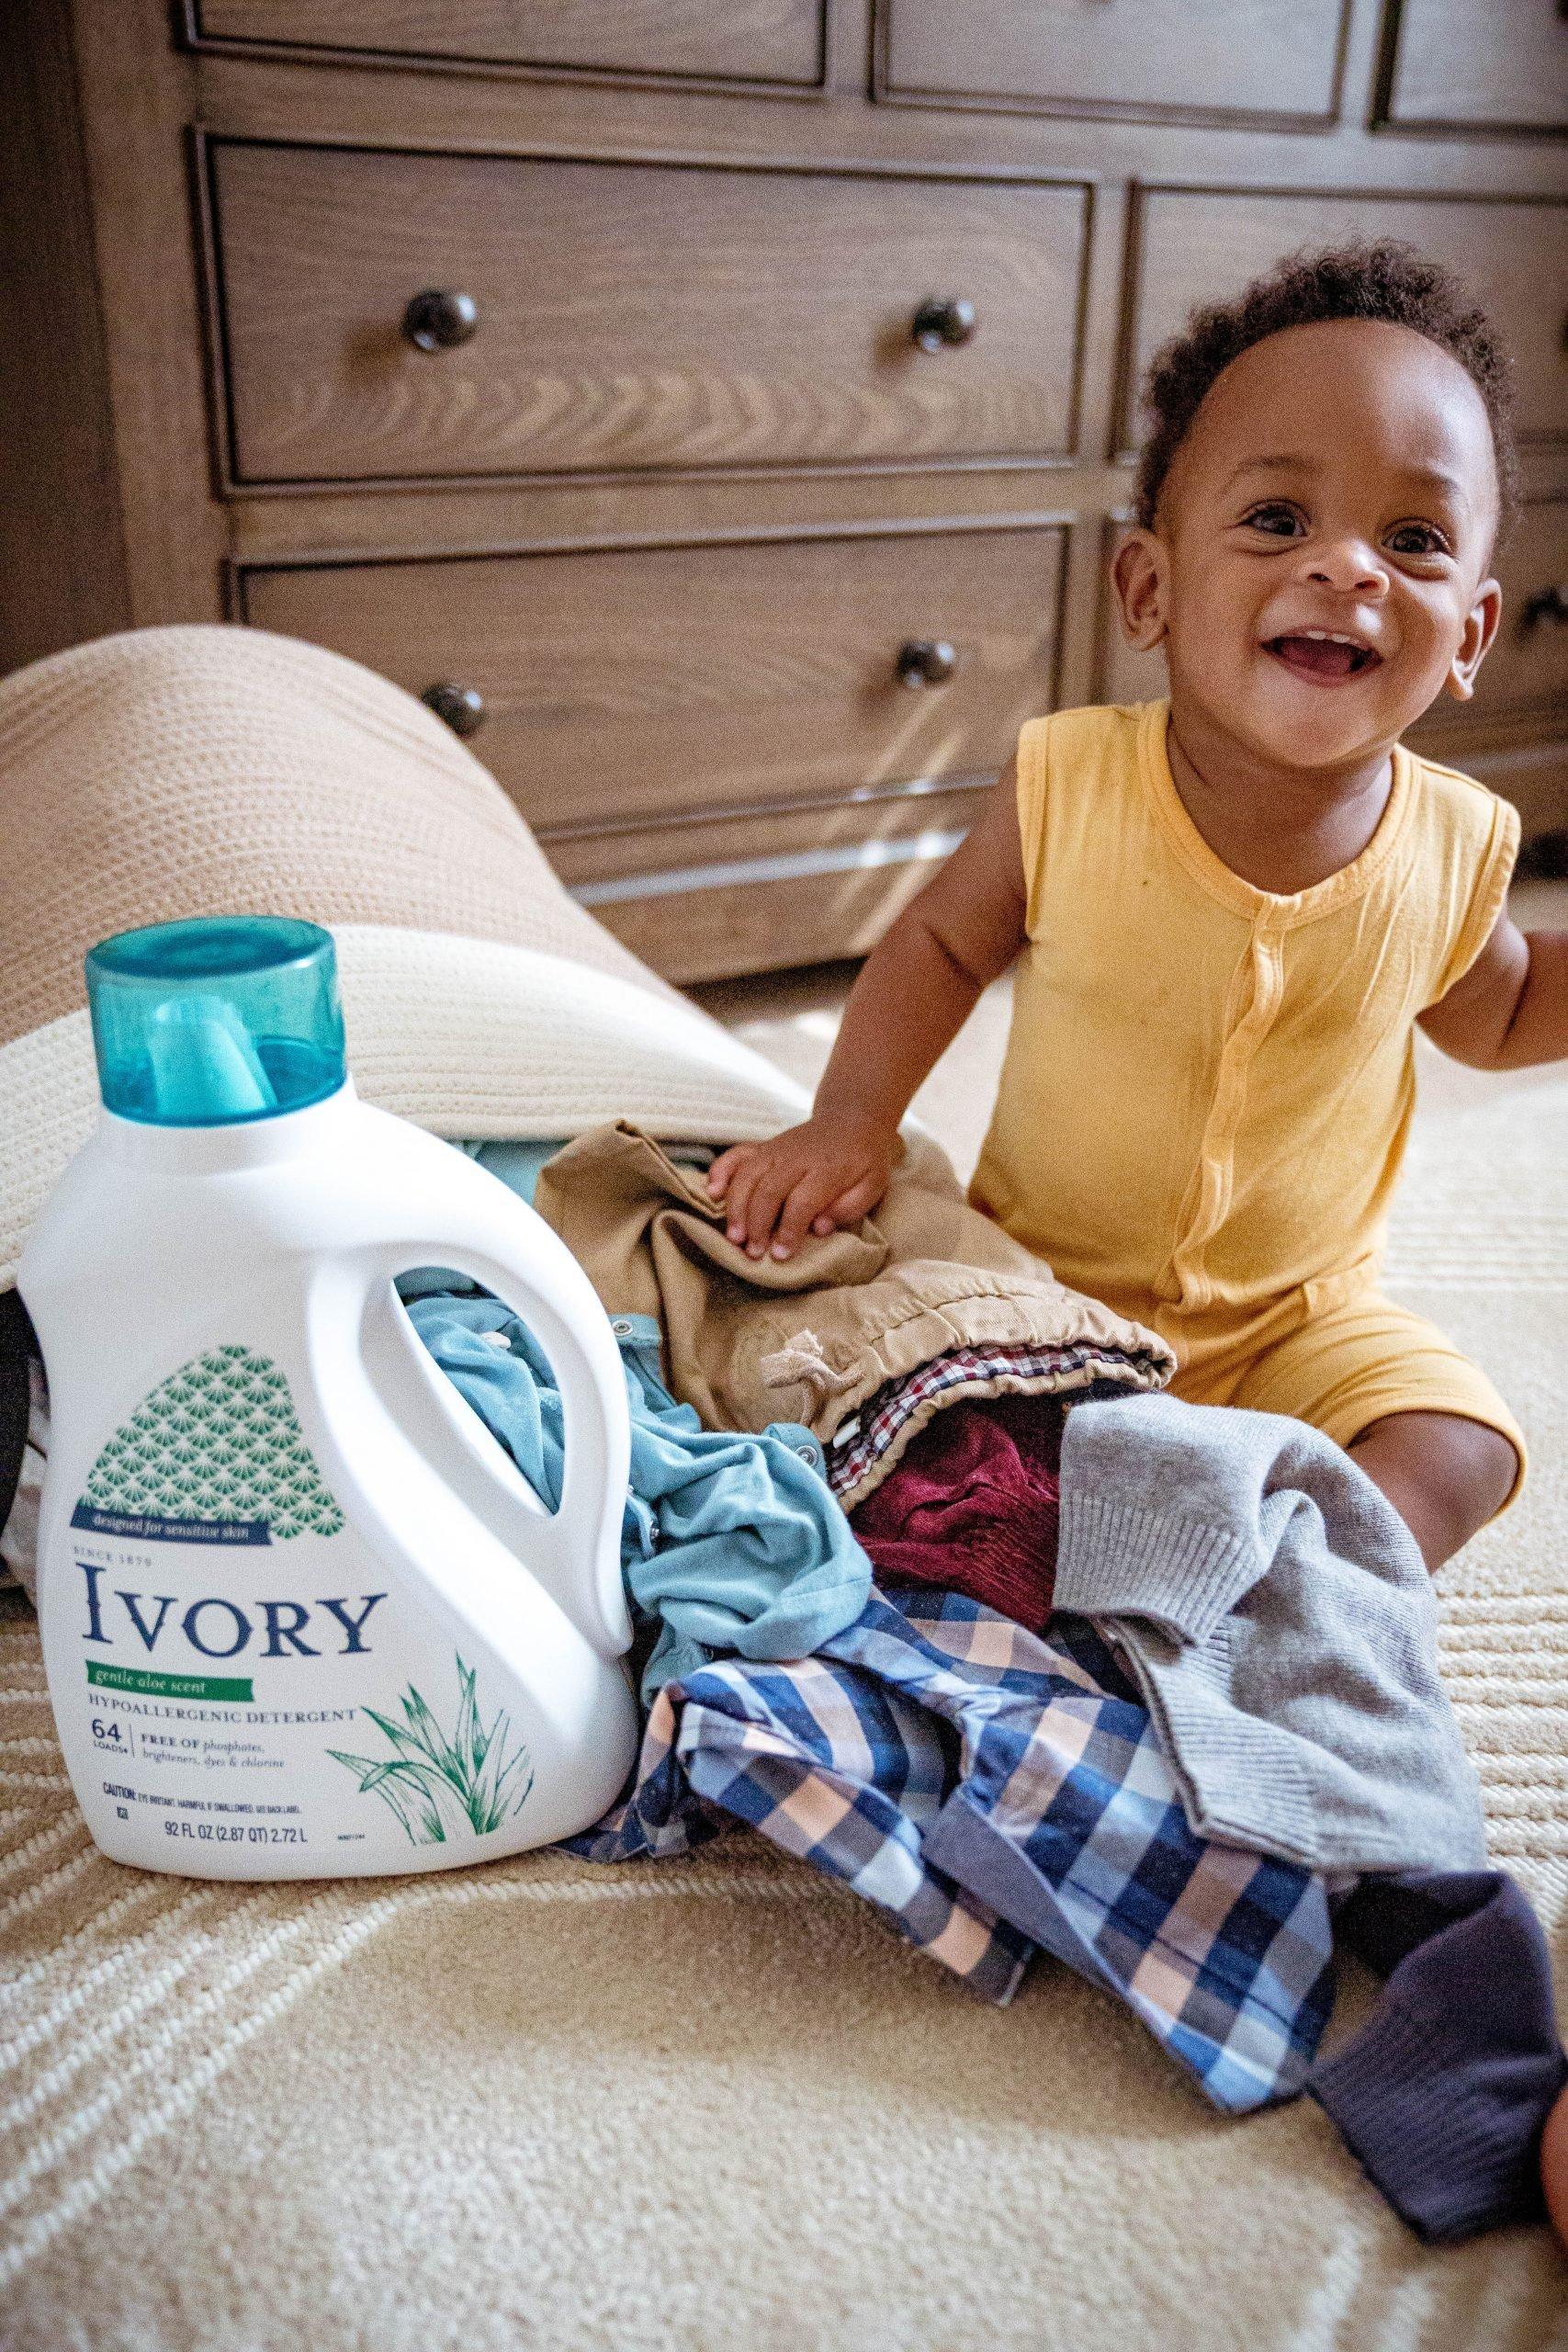 Livinglesh using ivory laundry detergent at walmart